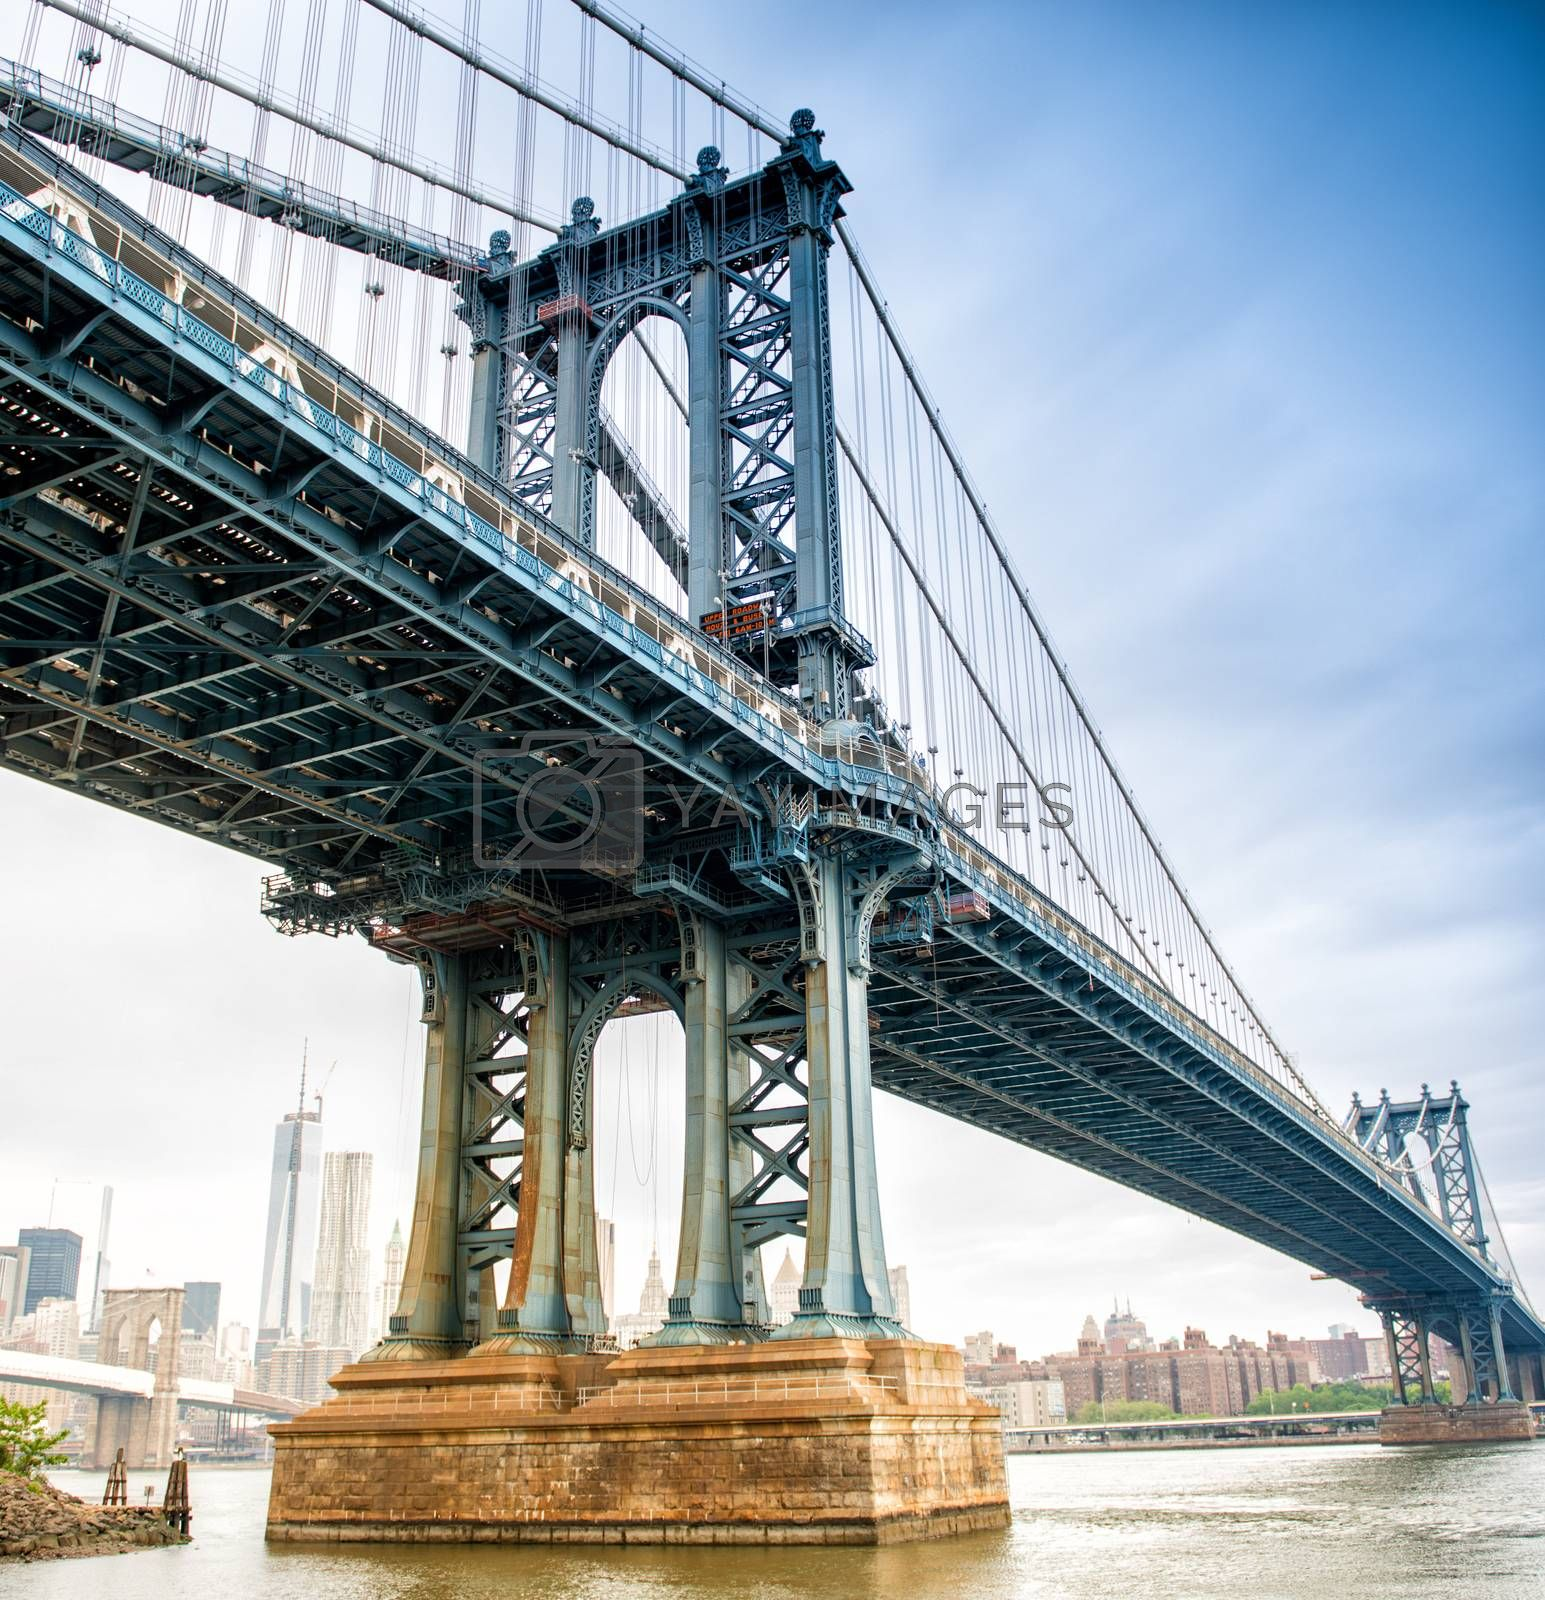 View of Manhattan Bridge on a overcast spring day - New York Cit by jovannig